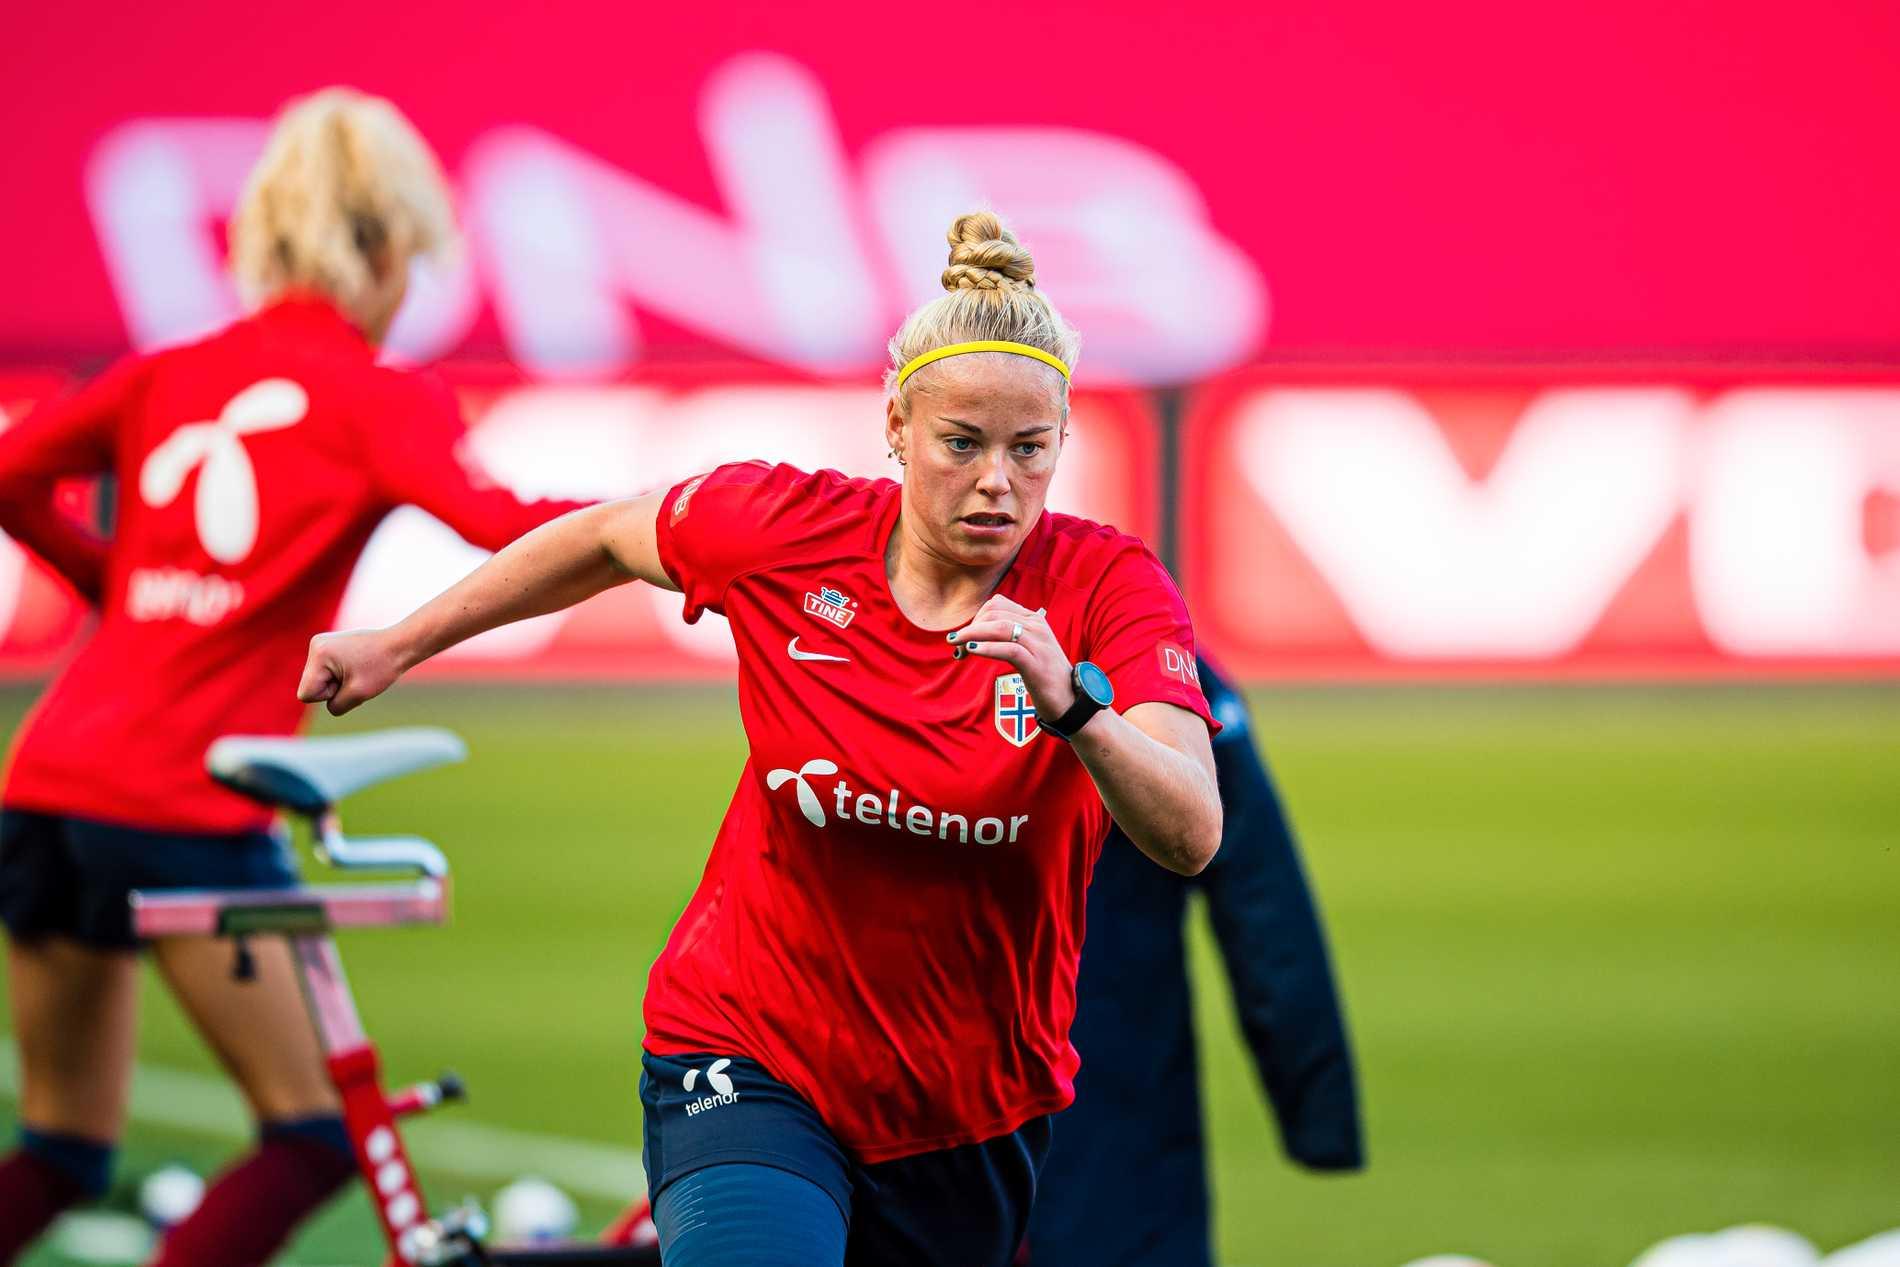 Therese Sessy Åsland i landslagströjan.